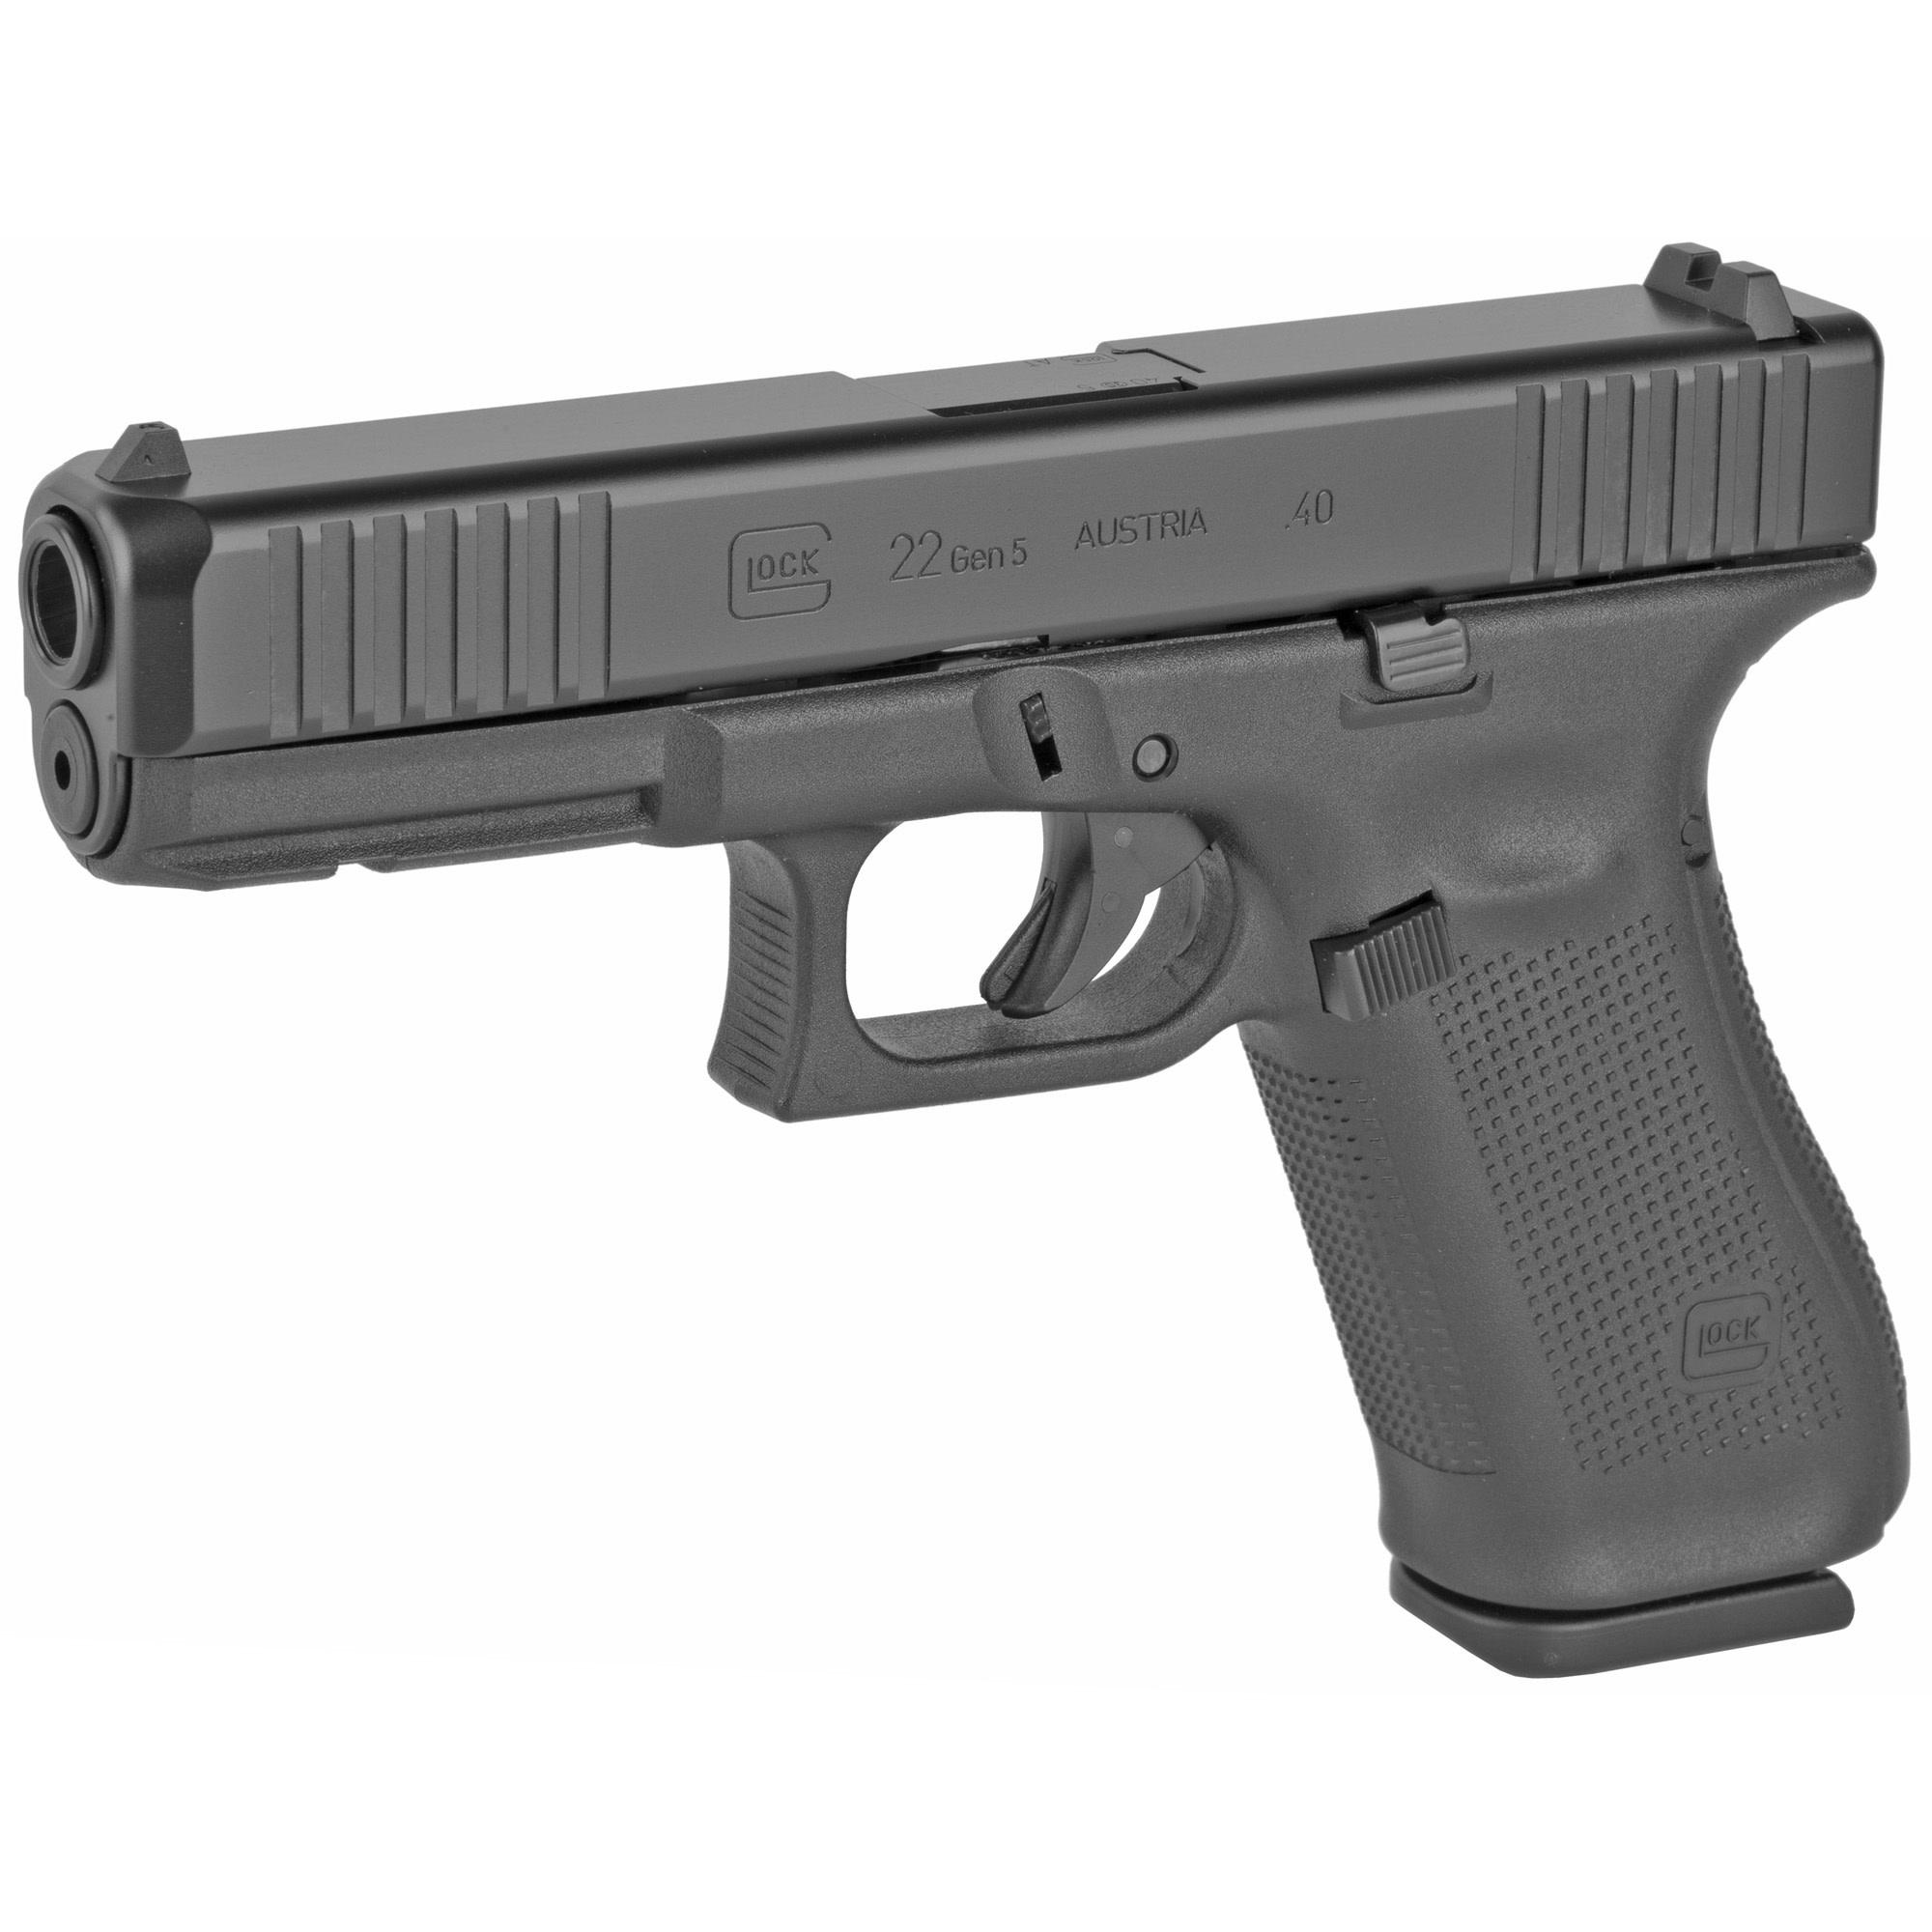 Glock 22 Gen 5, 40S&W, Marksman Barrel, 10Rd, 3 Magazines